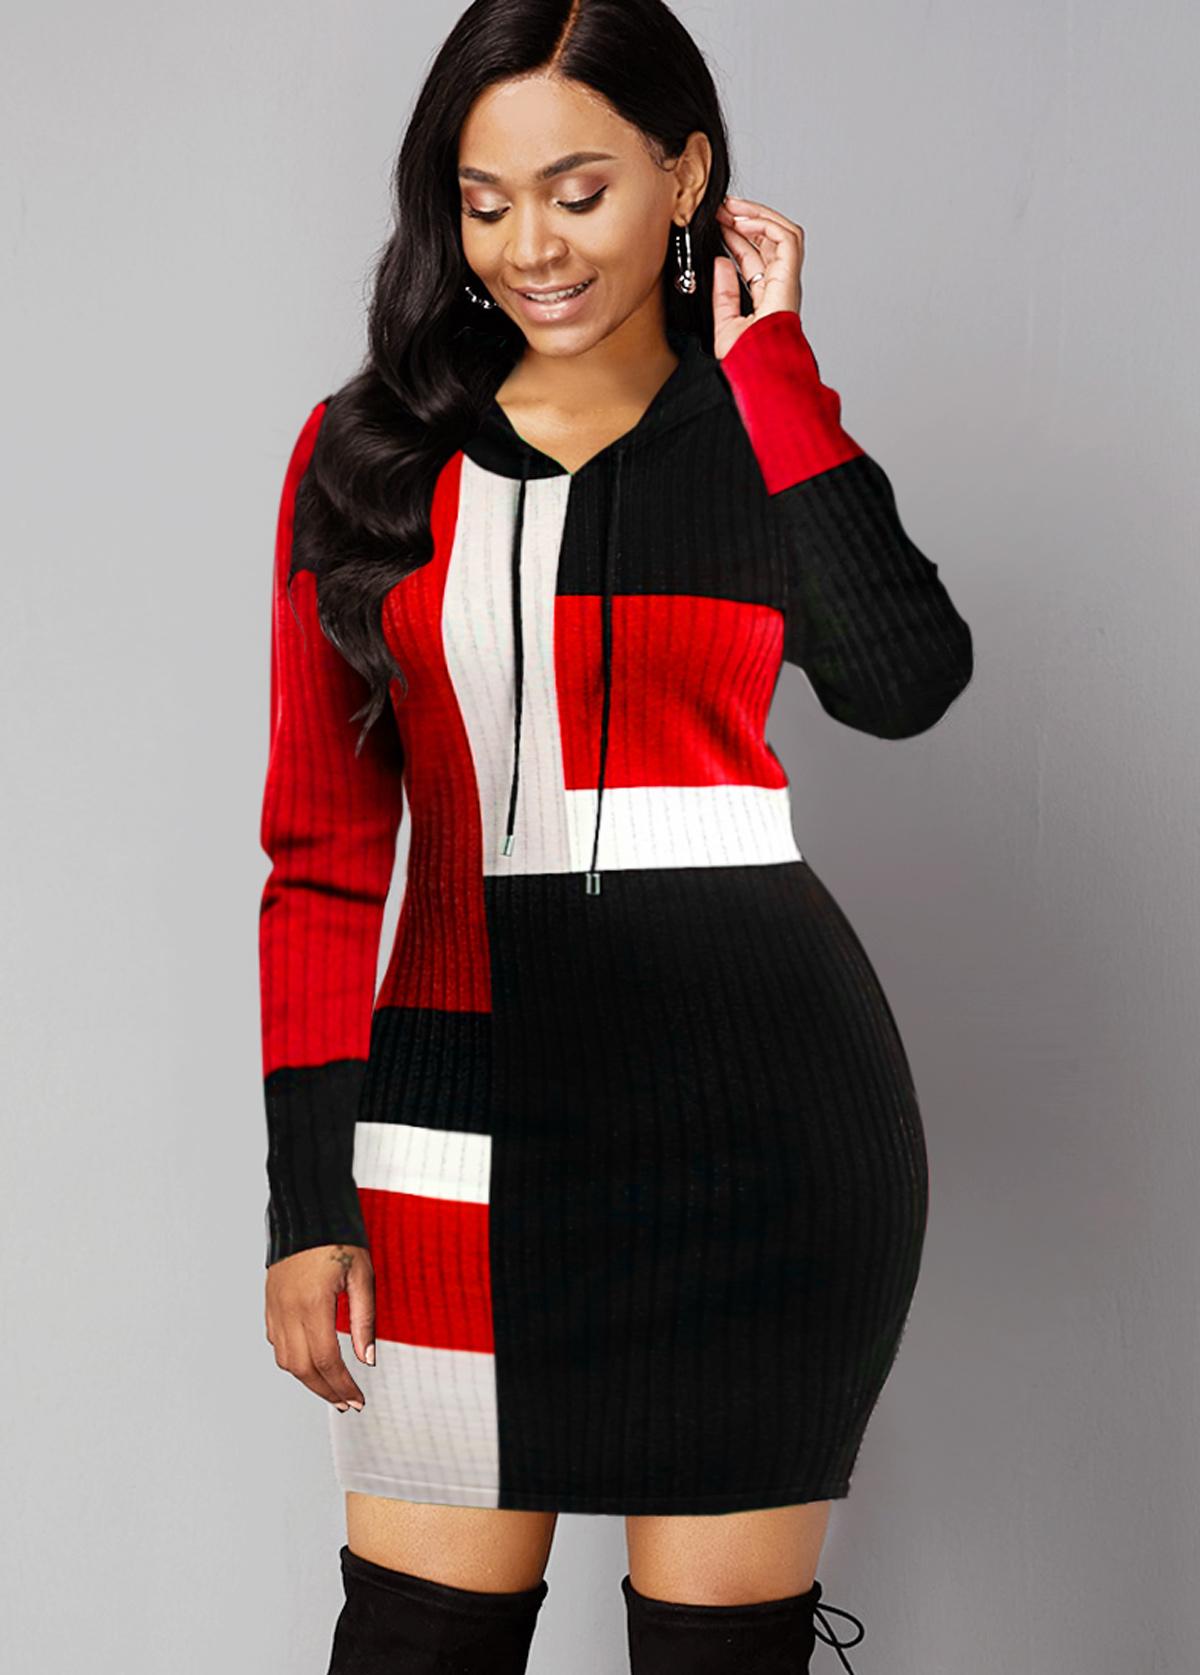 Contrast Long Sleeve Hooded Collar Sweater Dress